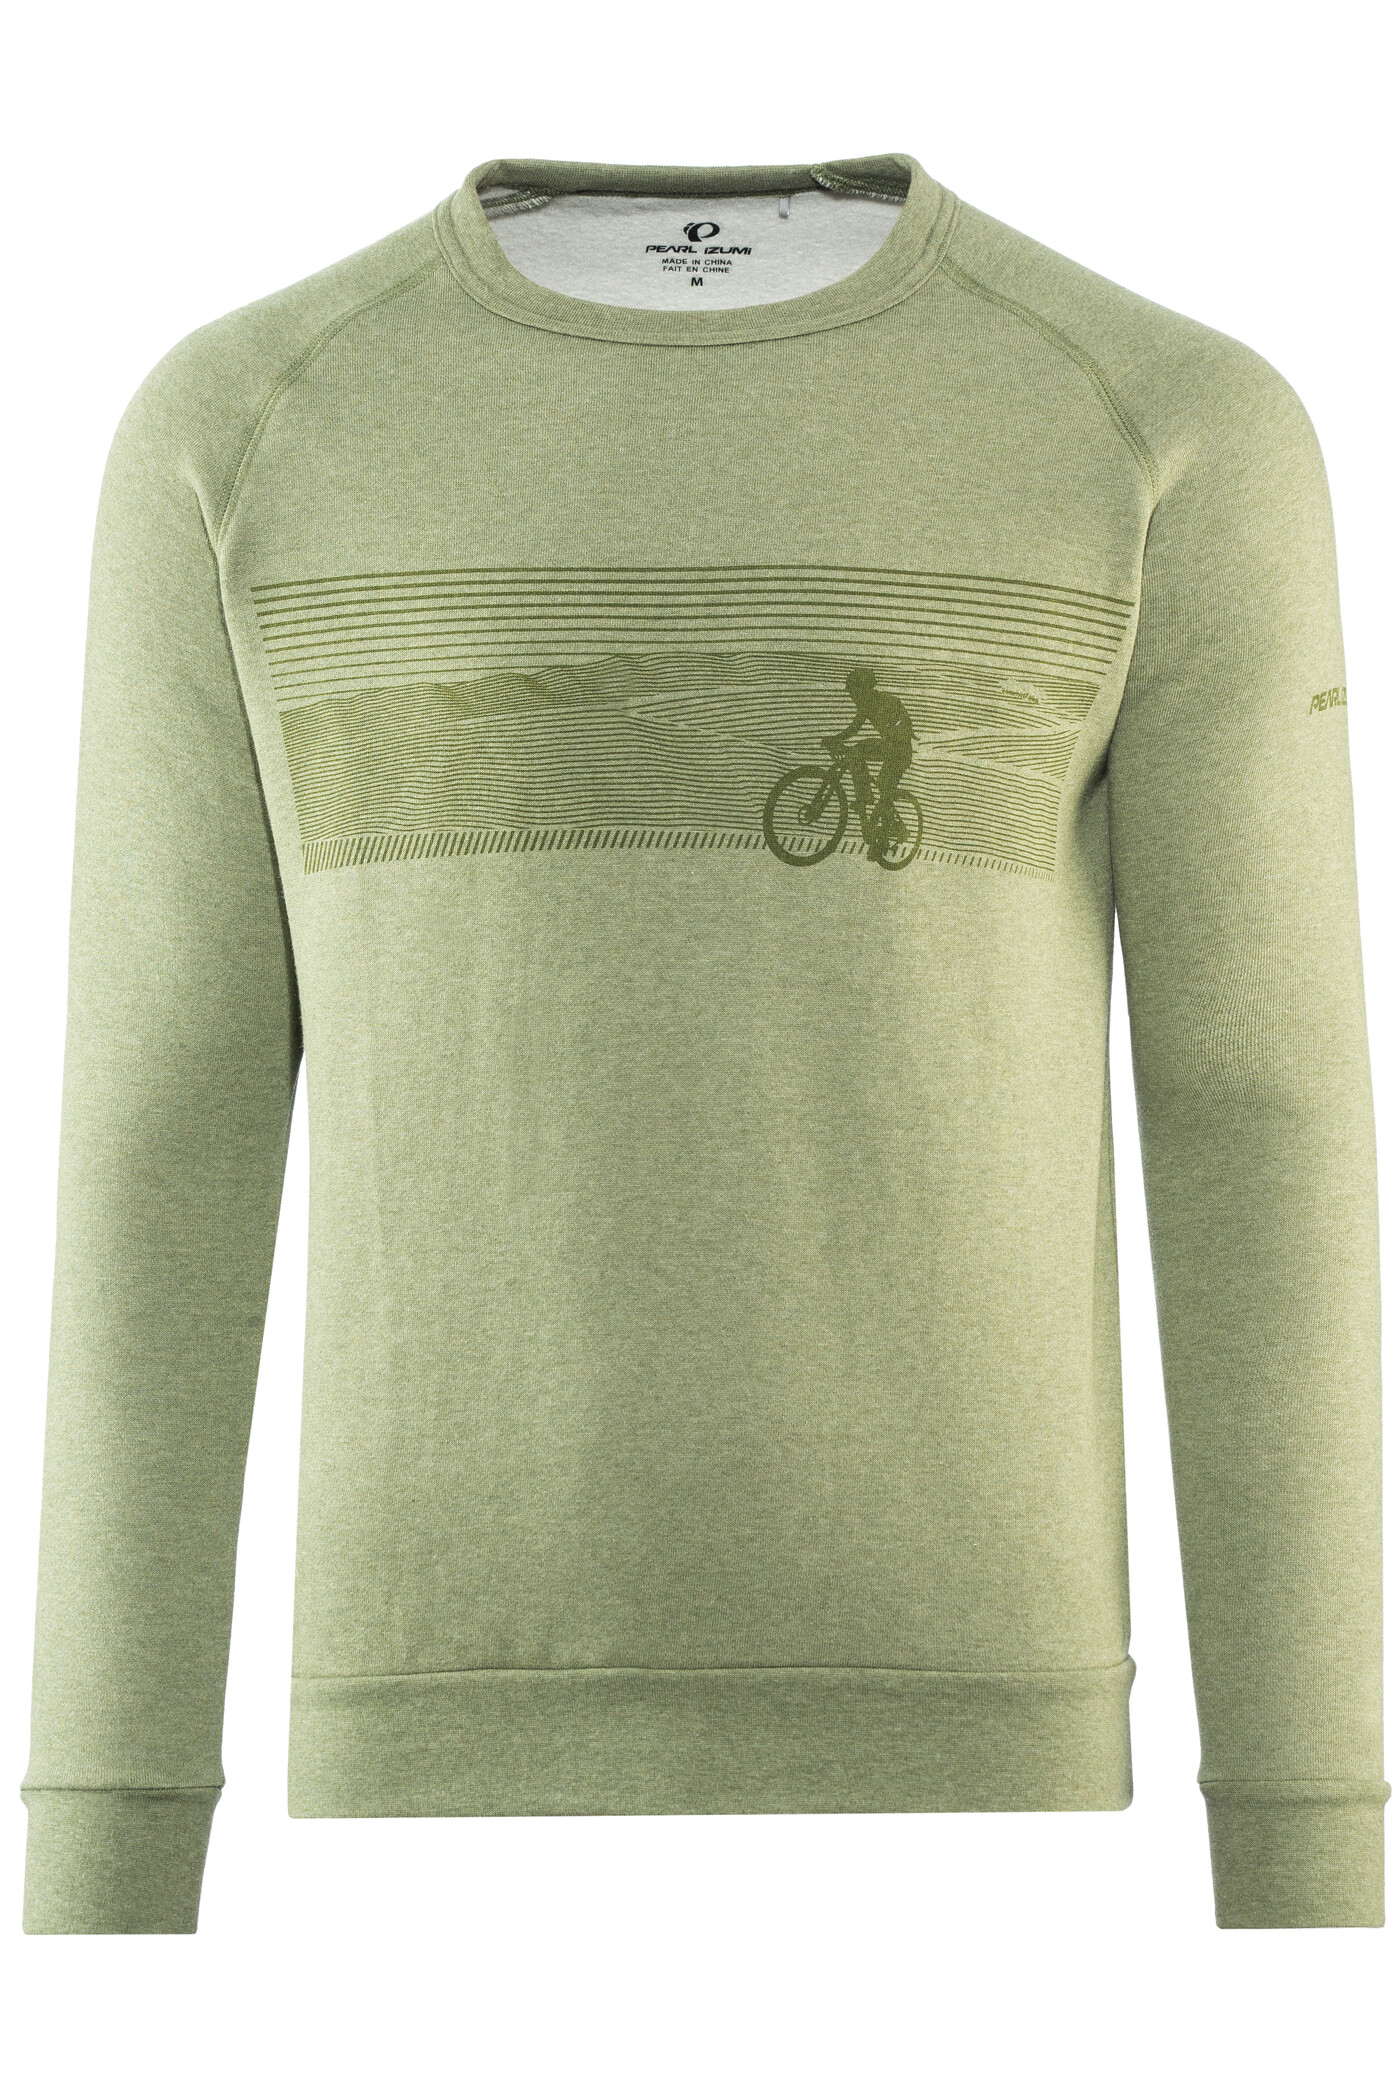 Original Rundhals Sweatshirt Herren Online kaufen